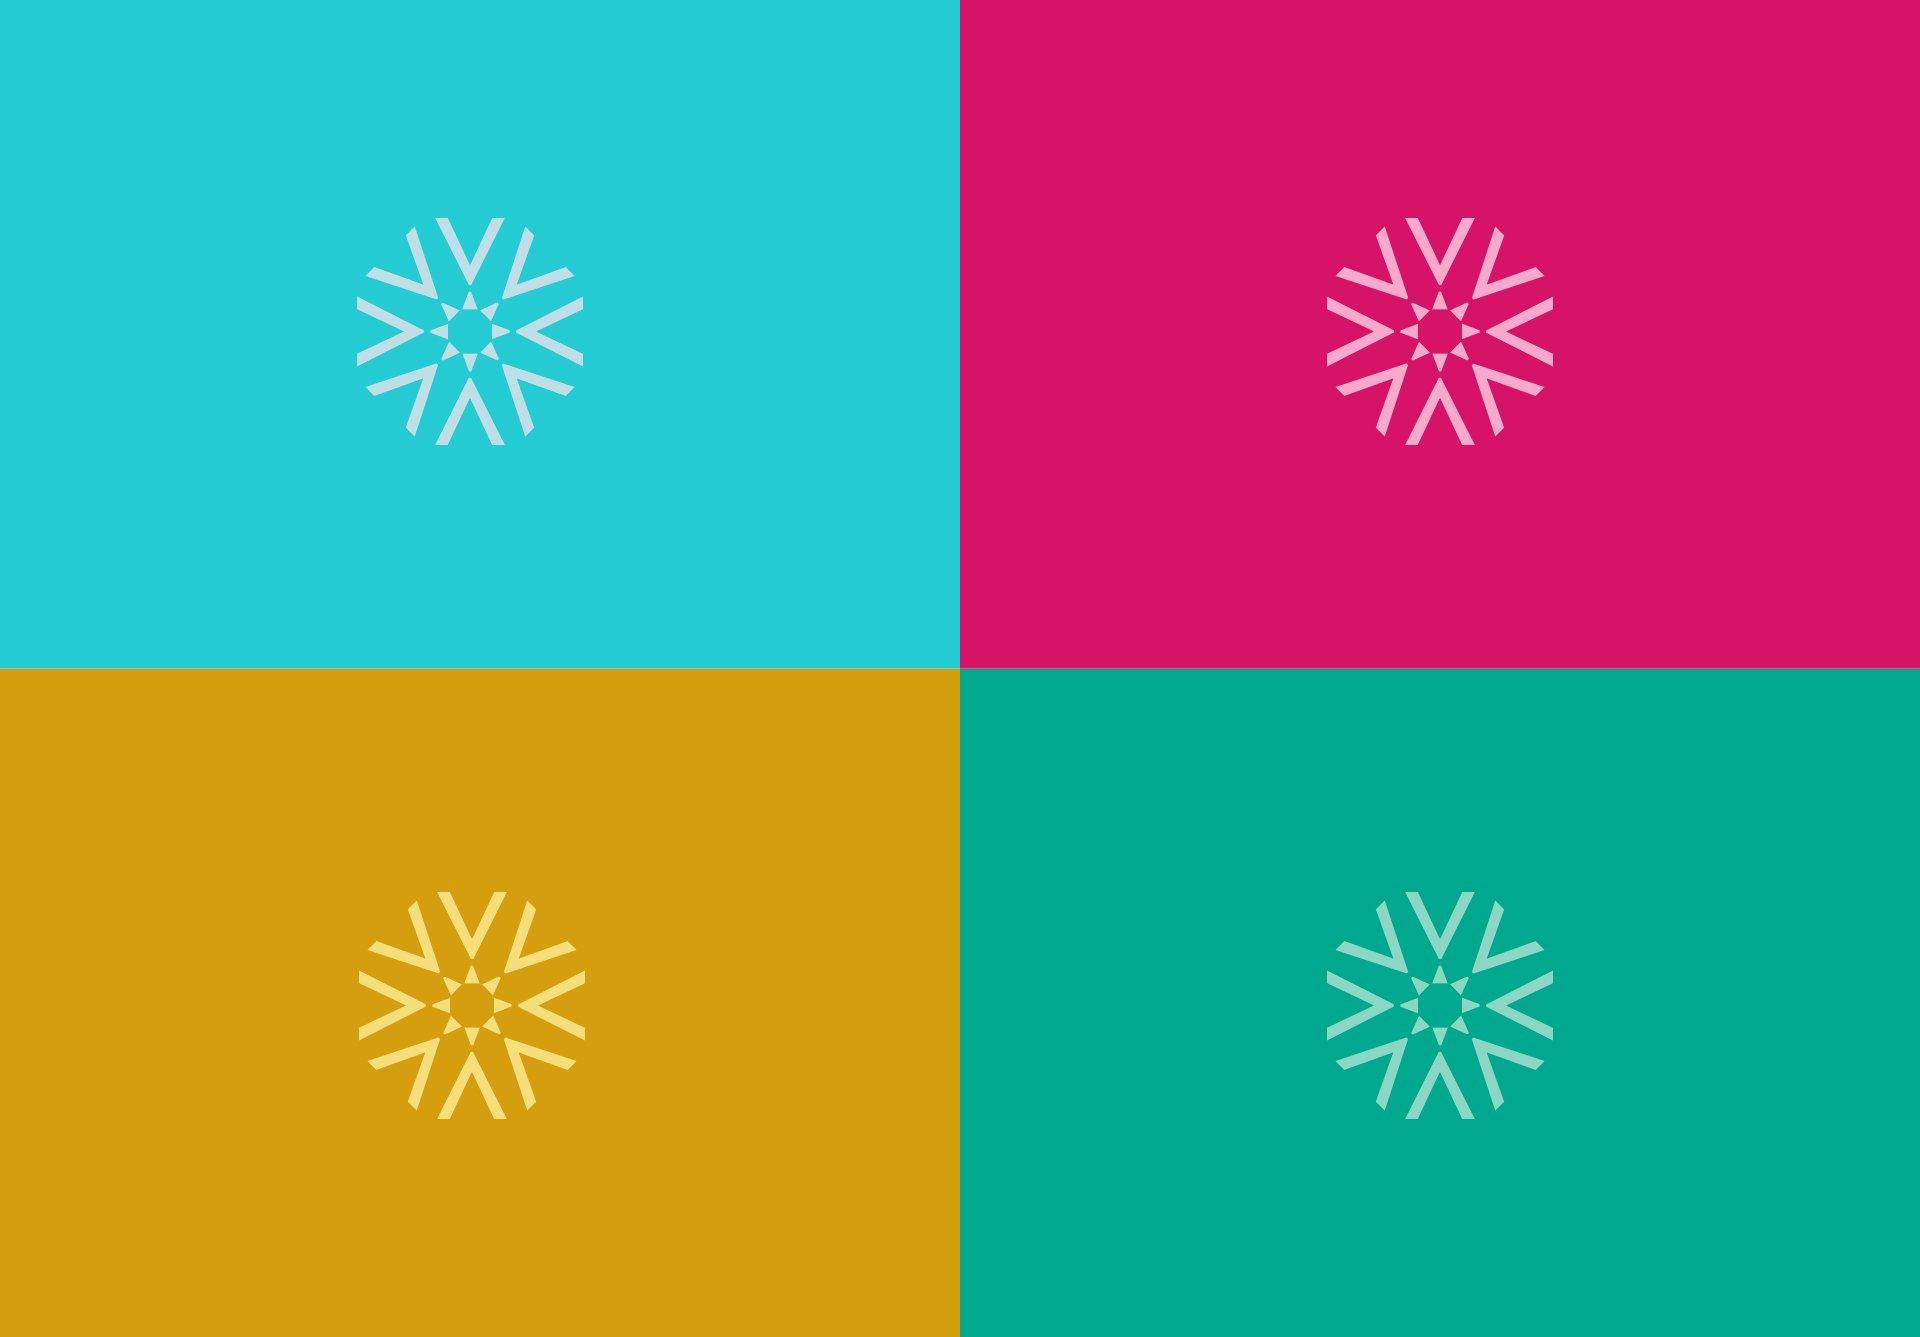 imagen-de-marca-agencia-adhoc-2